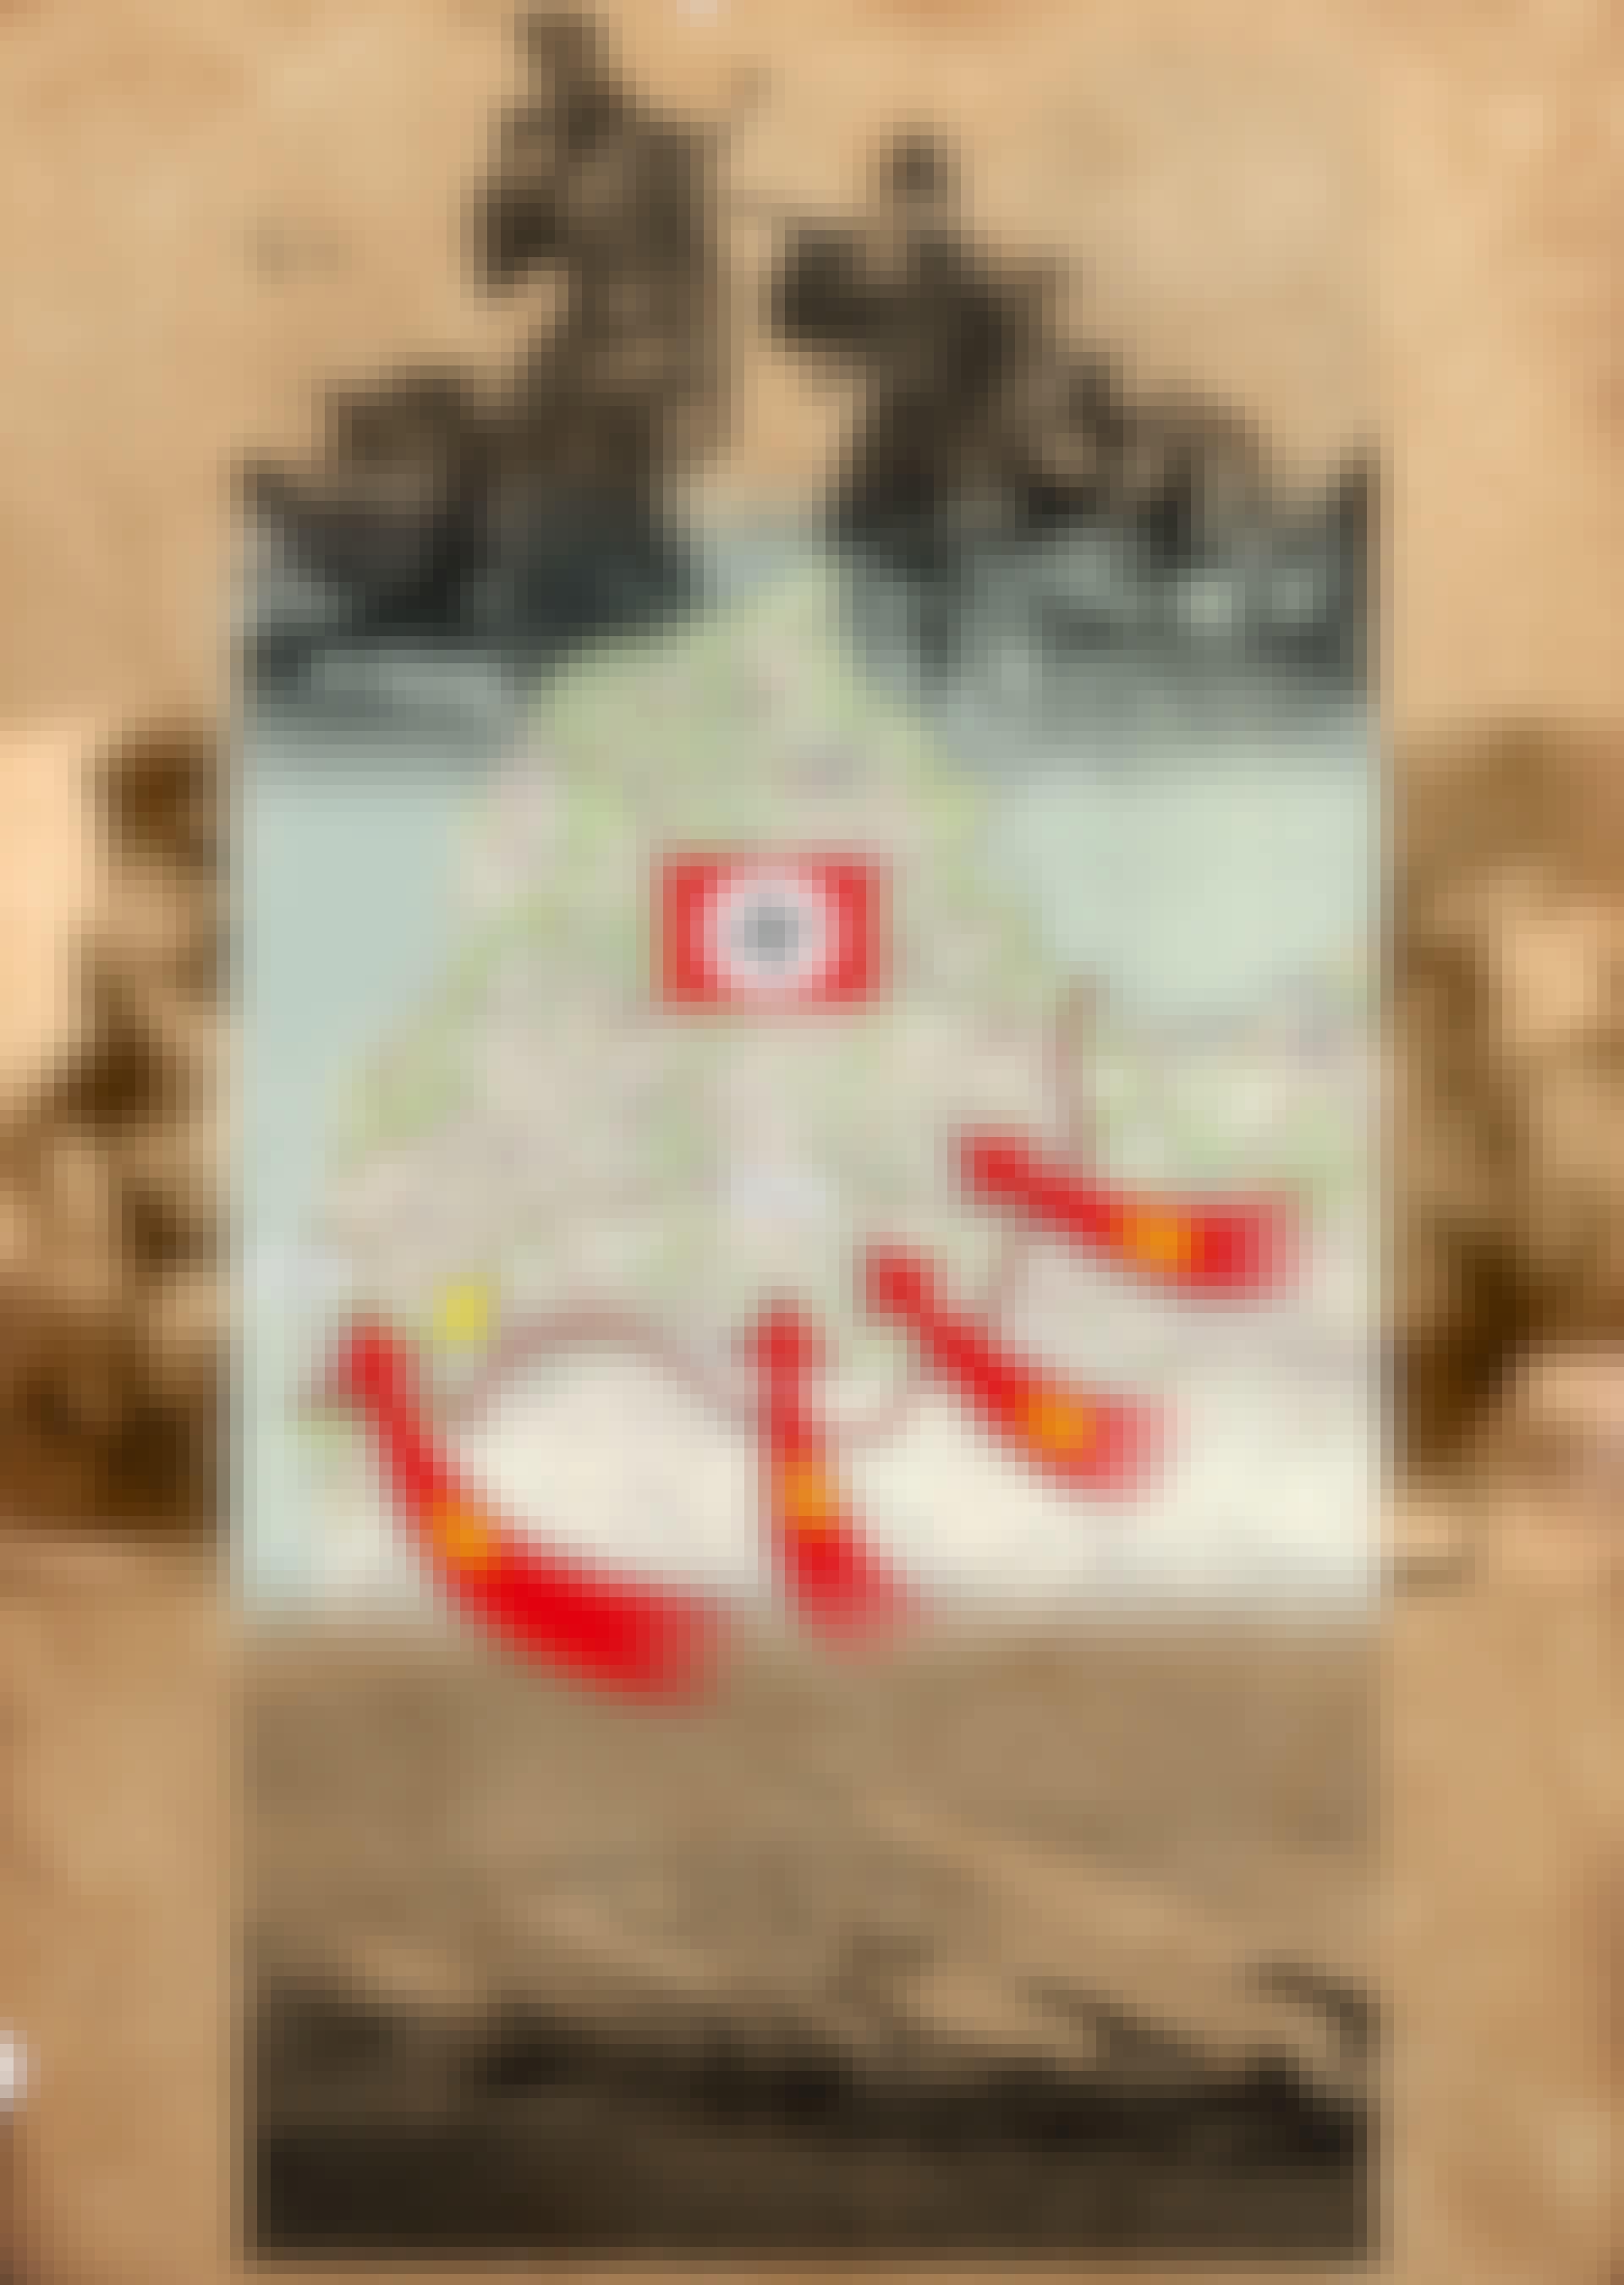 Kurland, 2 verdenskrig